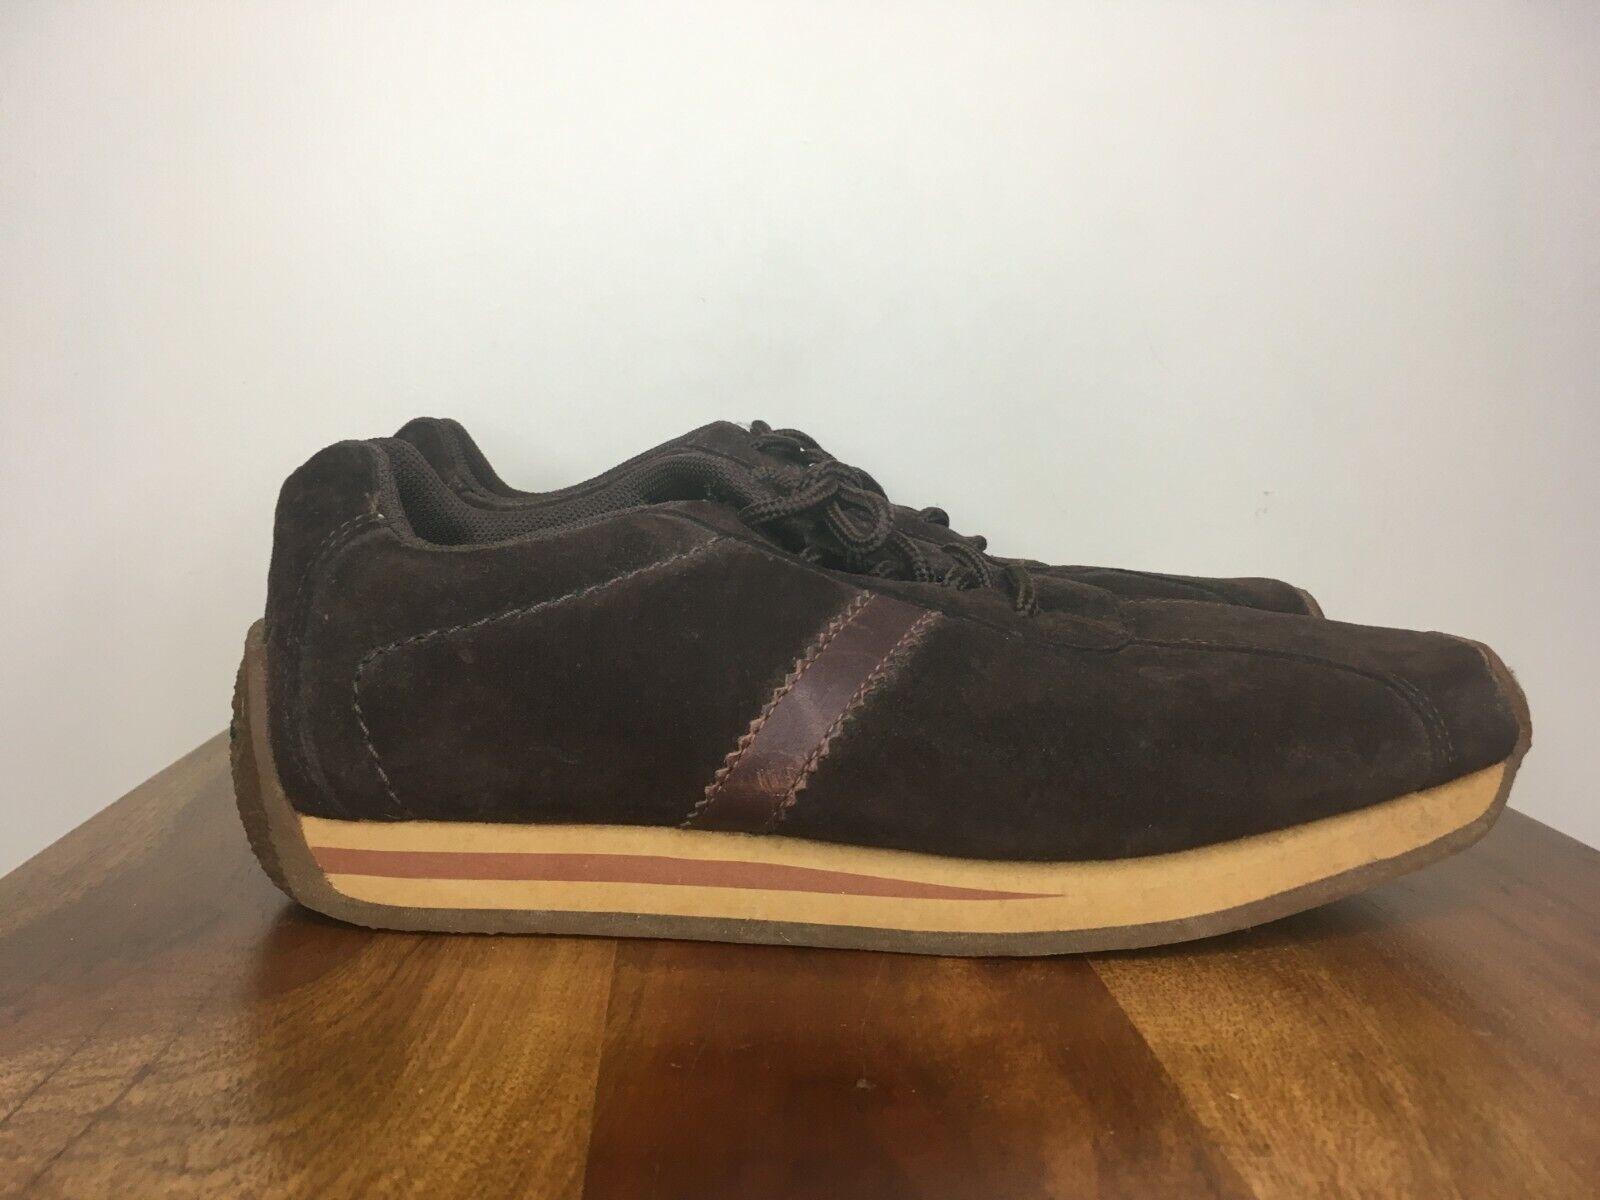 BEN SHERMAN 'Turkie' Vintage Casual Sneakers shoes Brown Gum Sole 90s 8